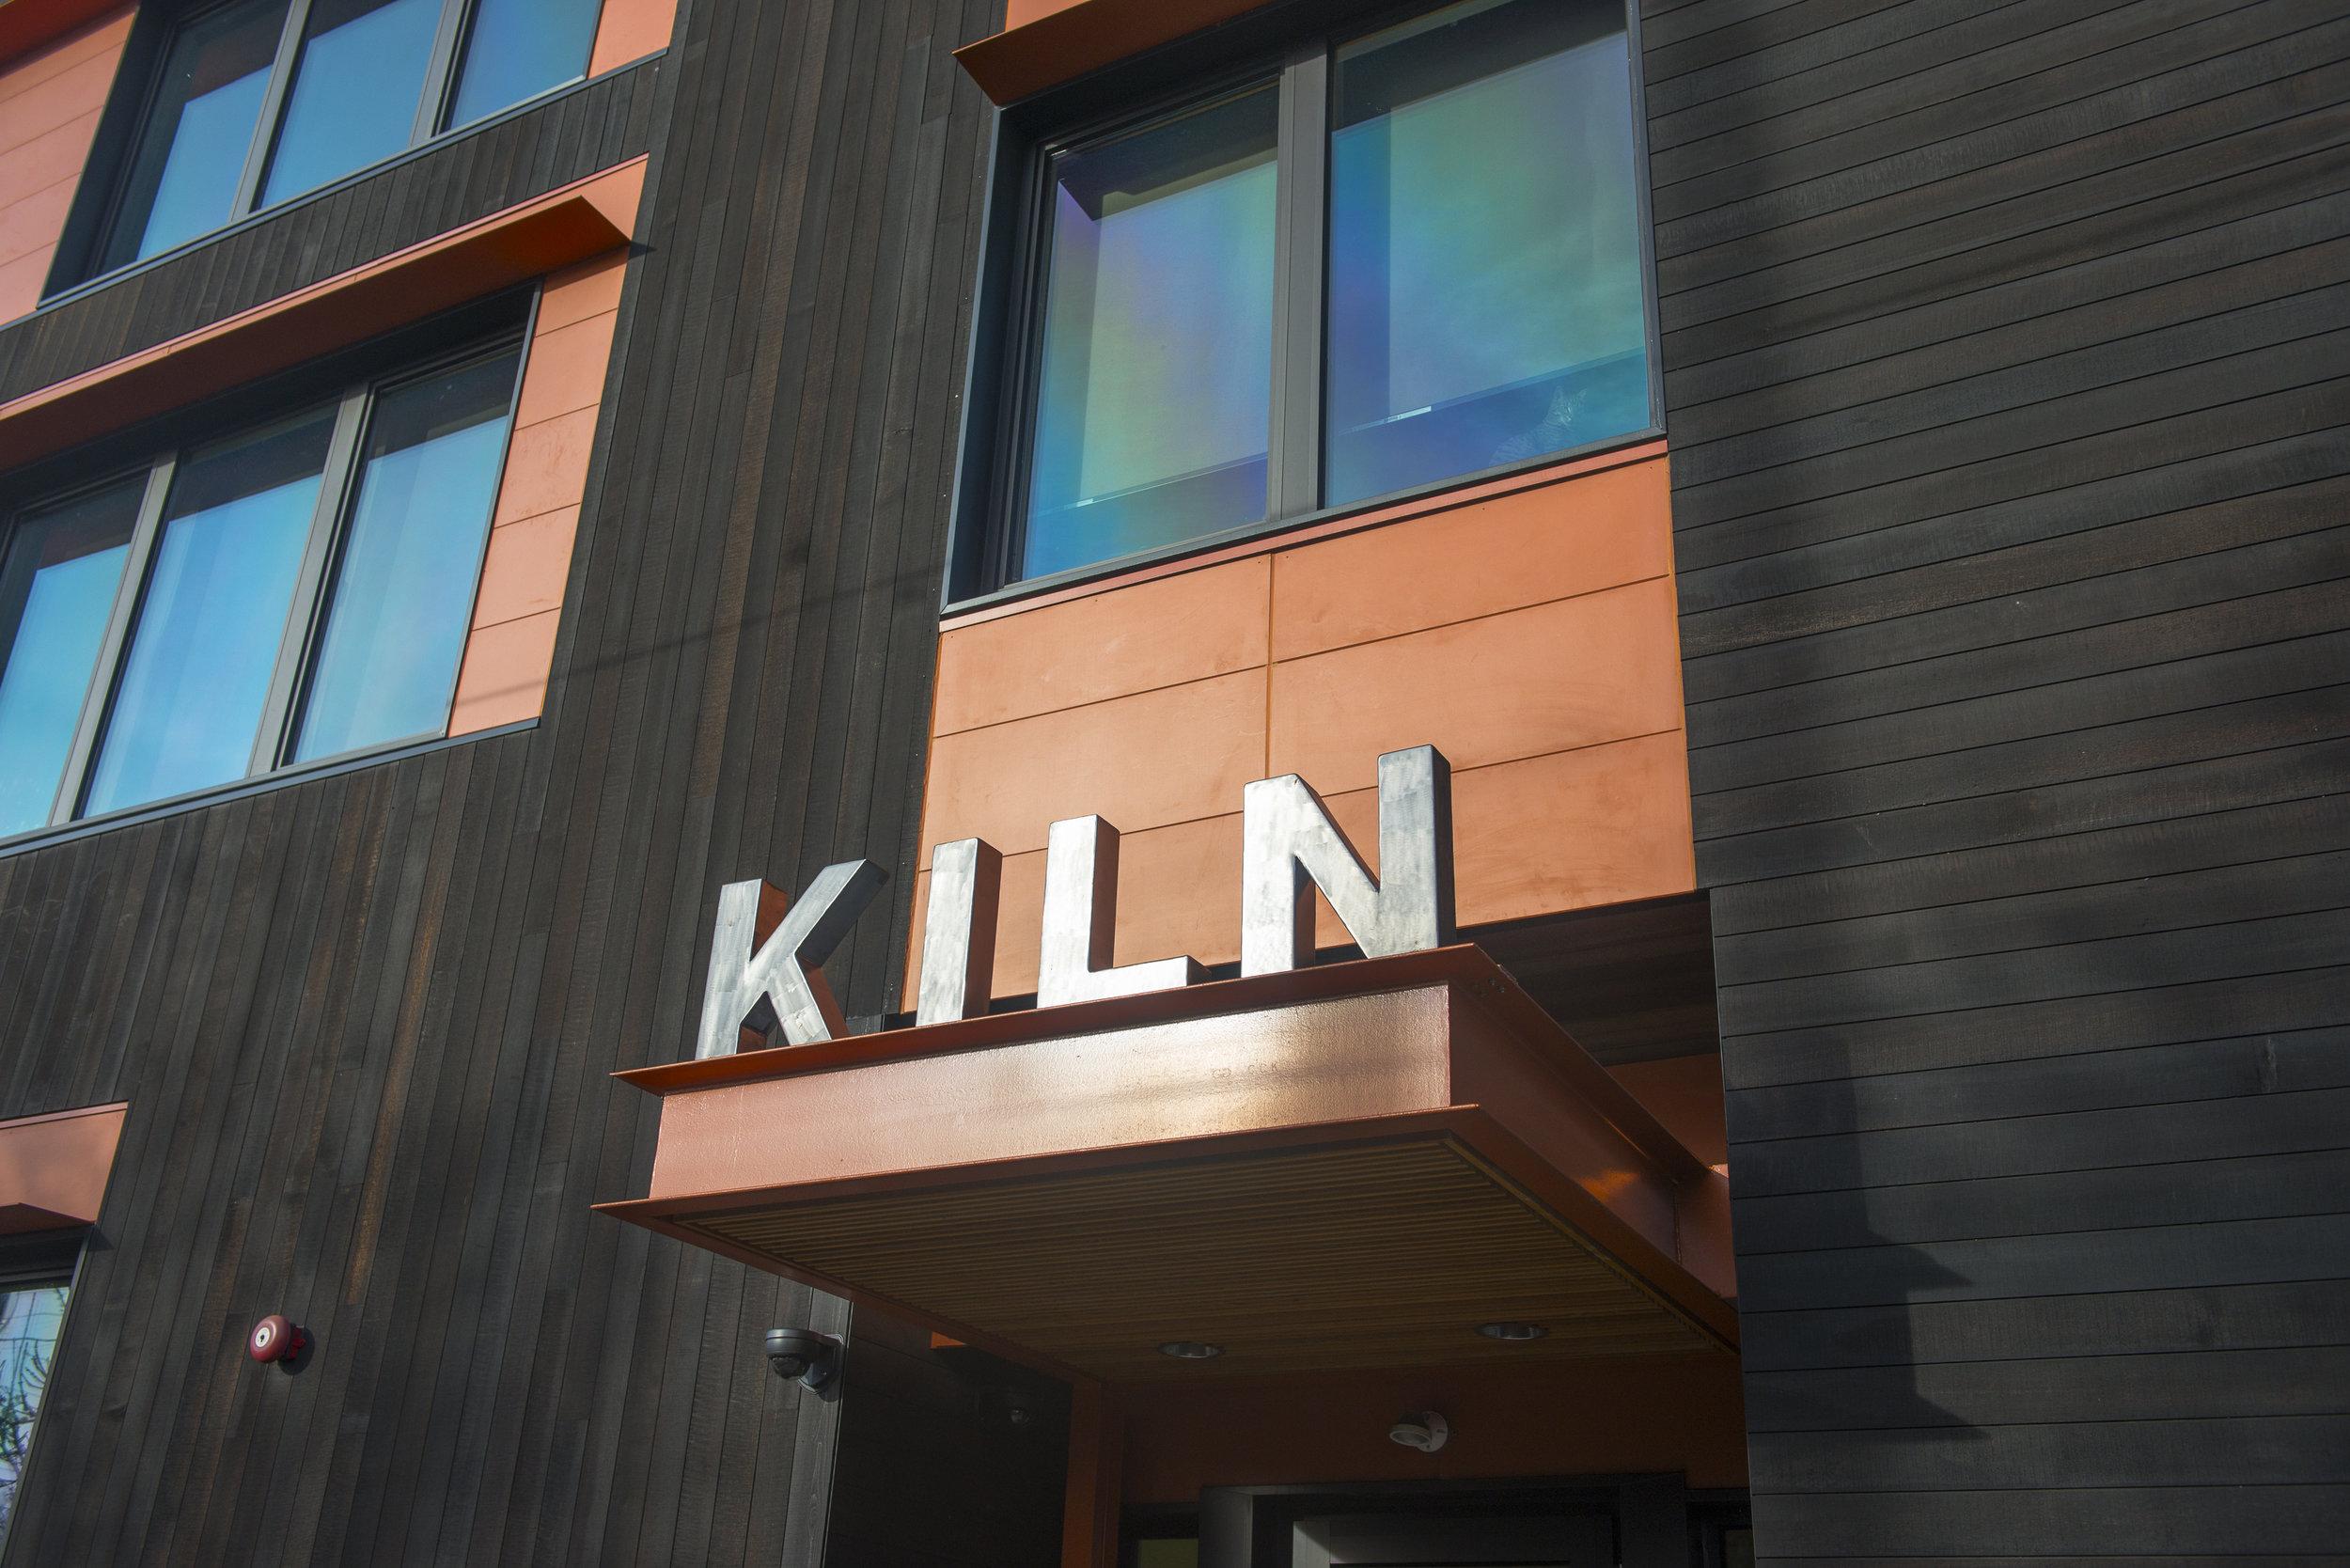 kiln sign 1.jpg